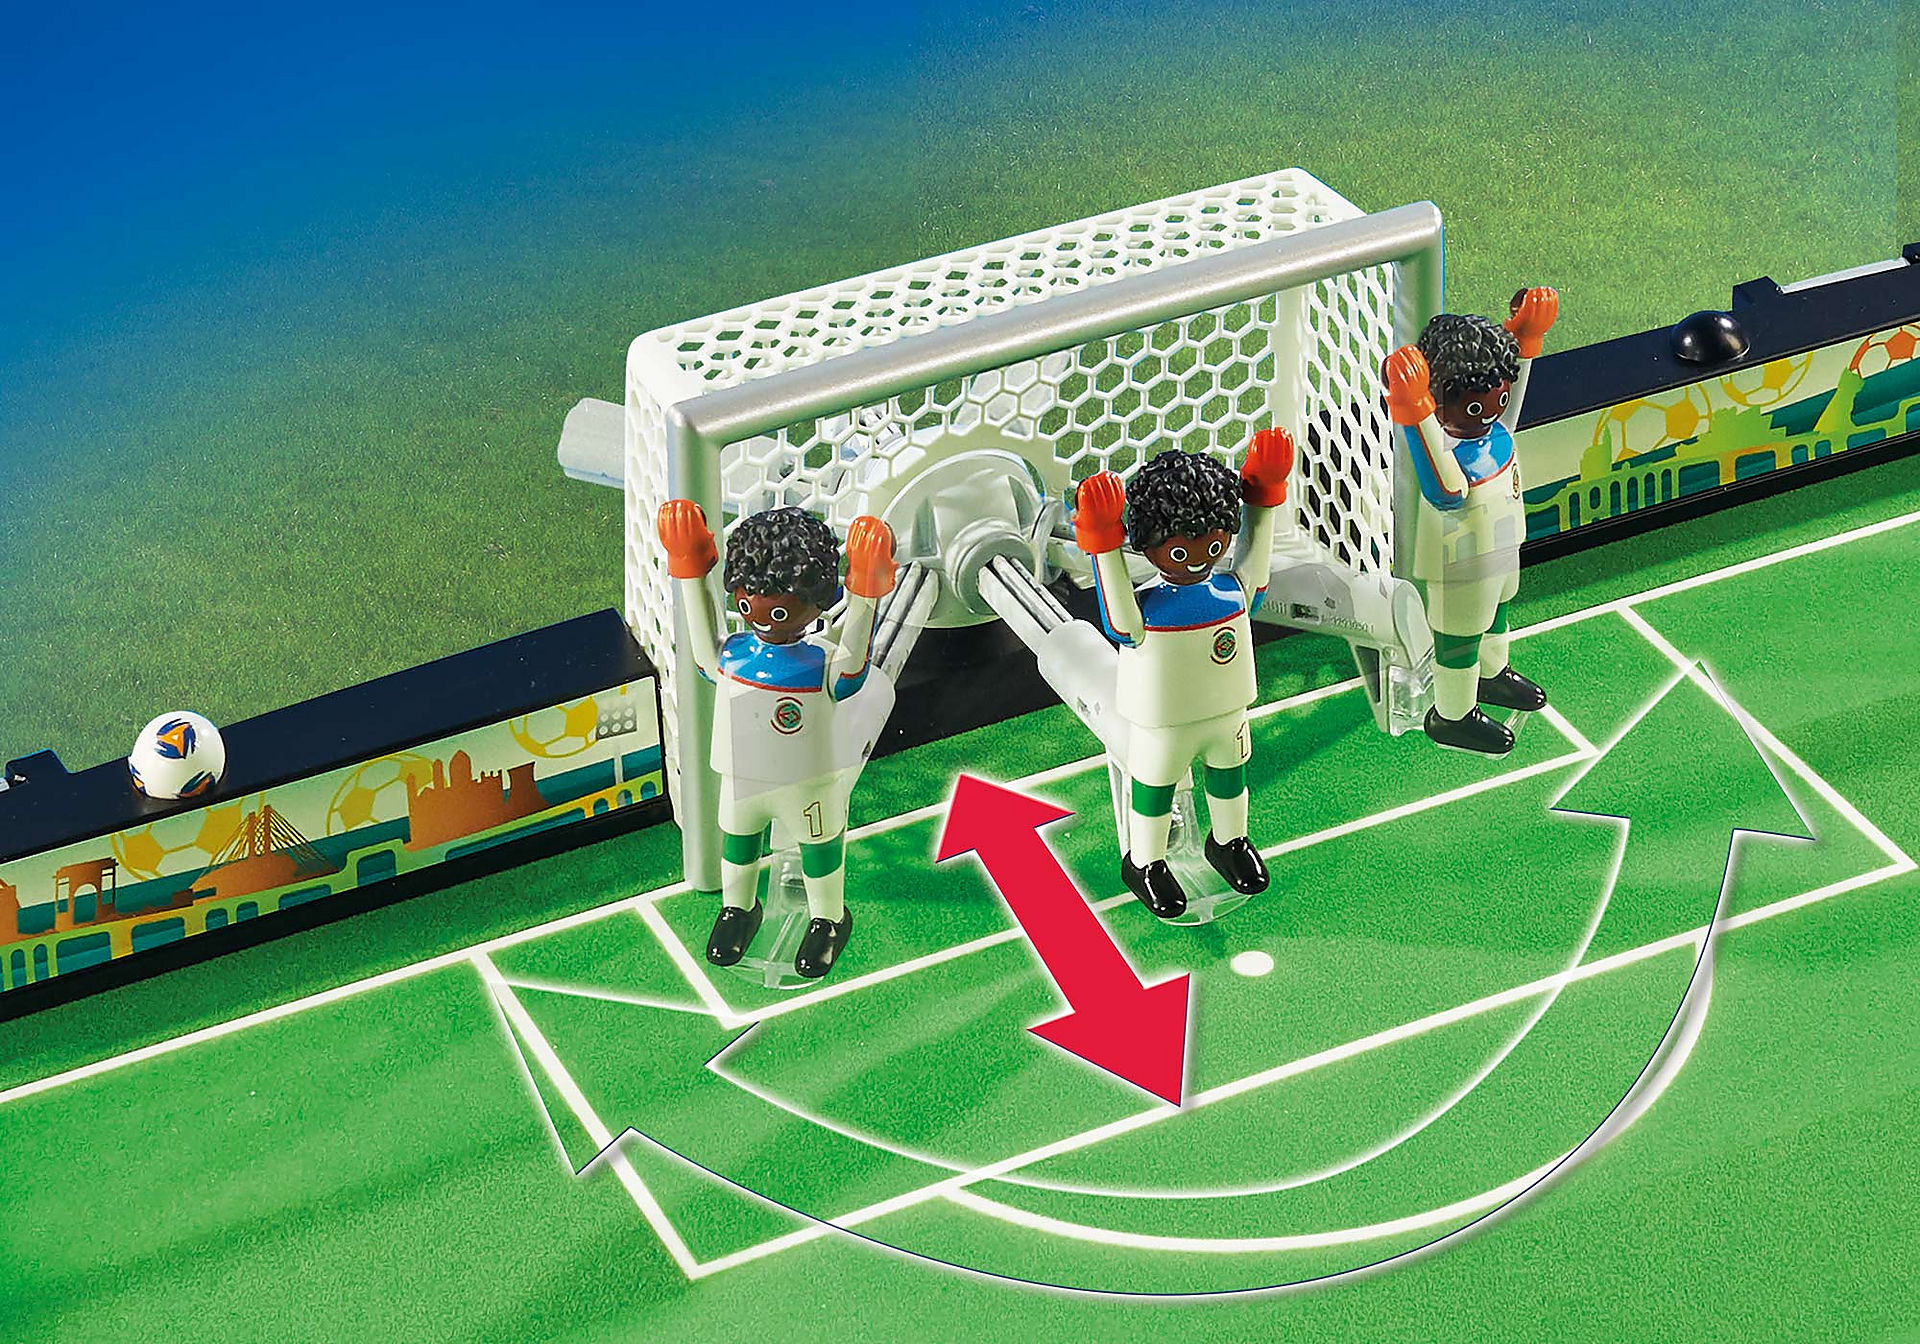 70244 Hordozható futballaréna zoom image4